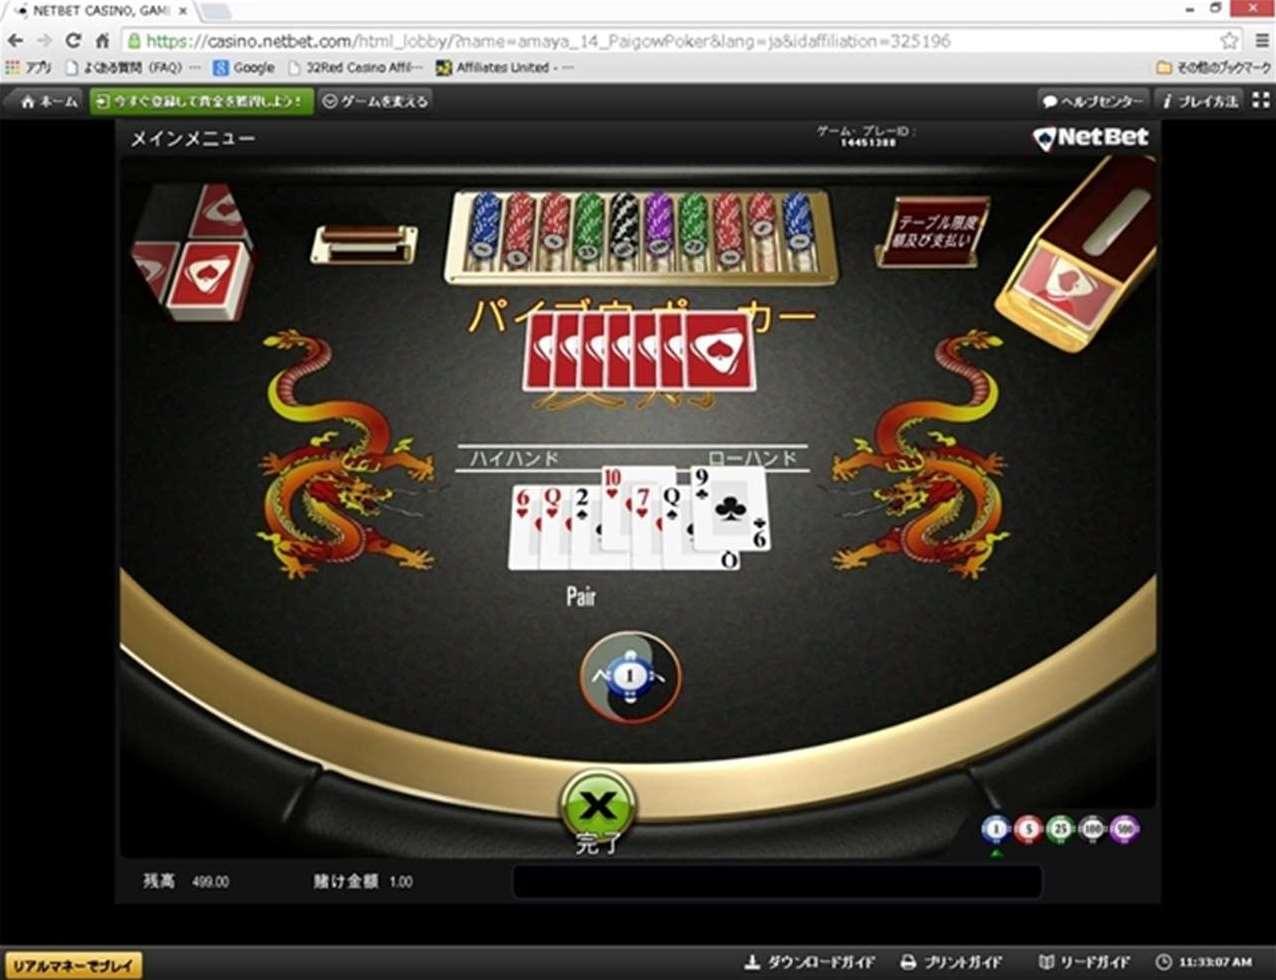 Net Bet Paigow Poker4